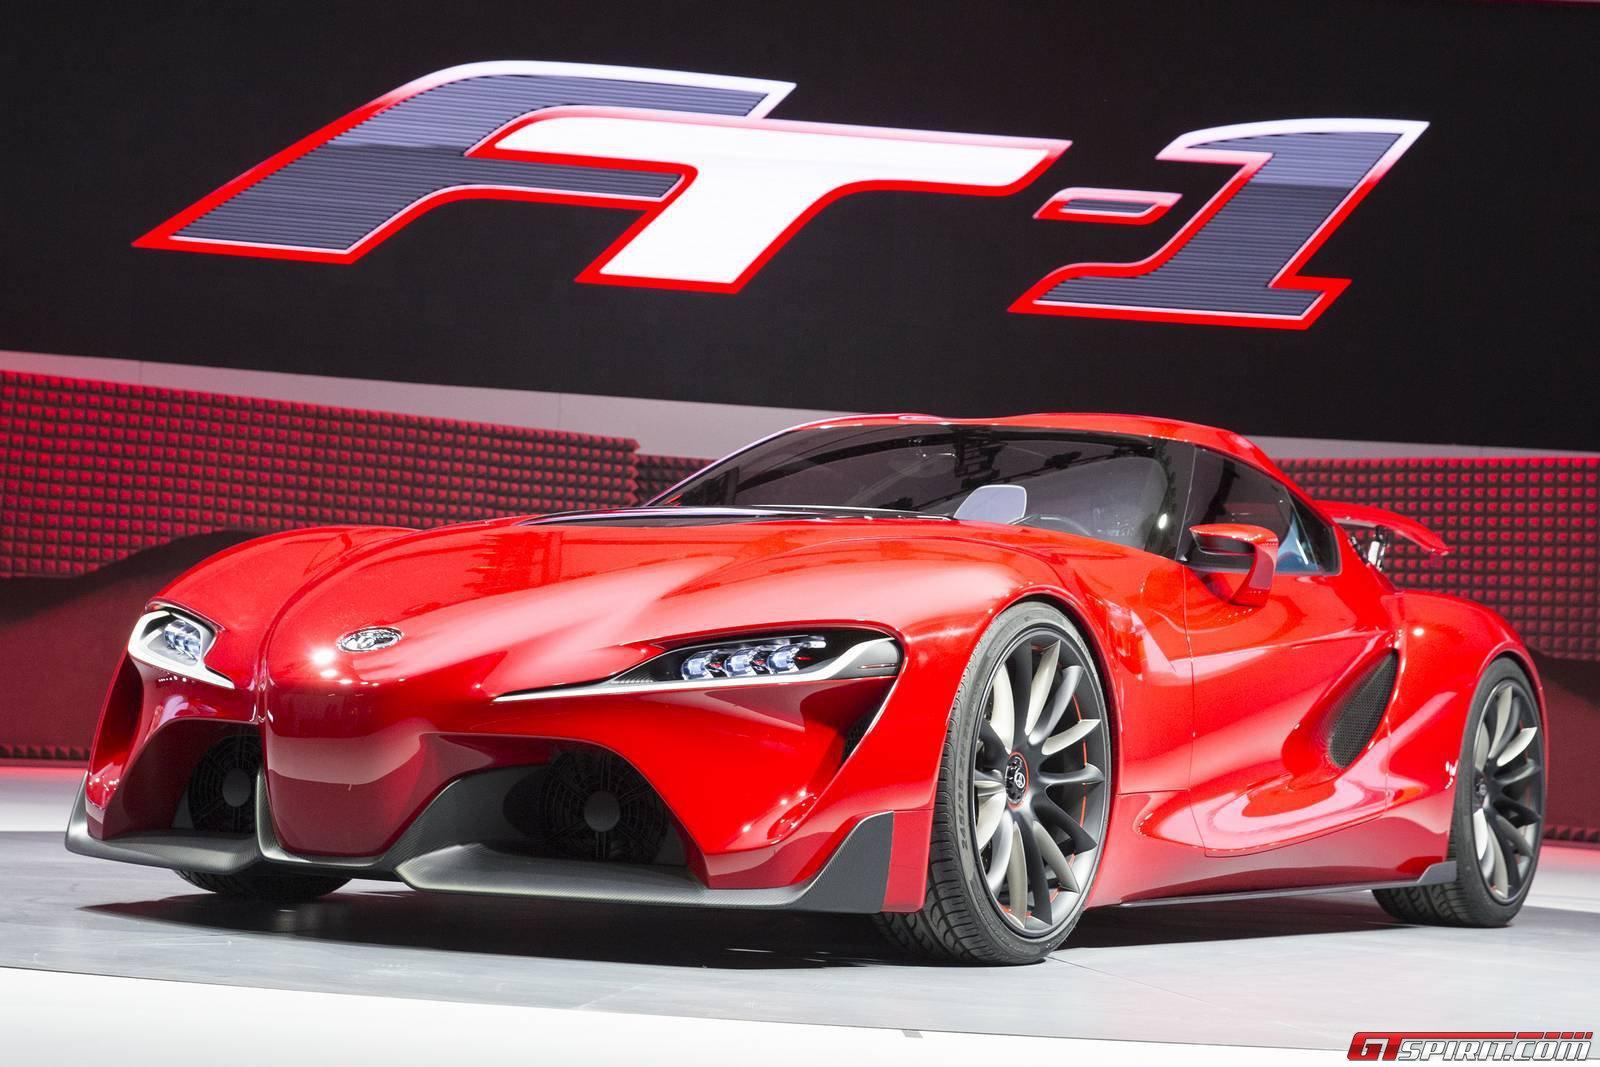 Detroit Auto Show 2014: Toyota FT-1 Concept bất ngờ lộ diện